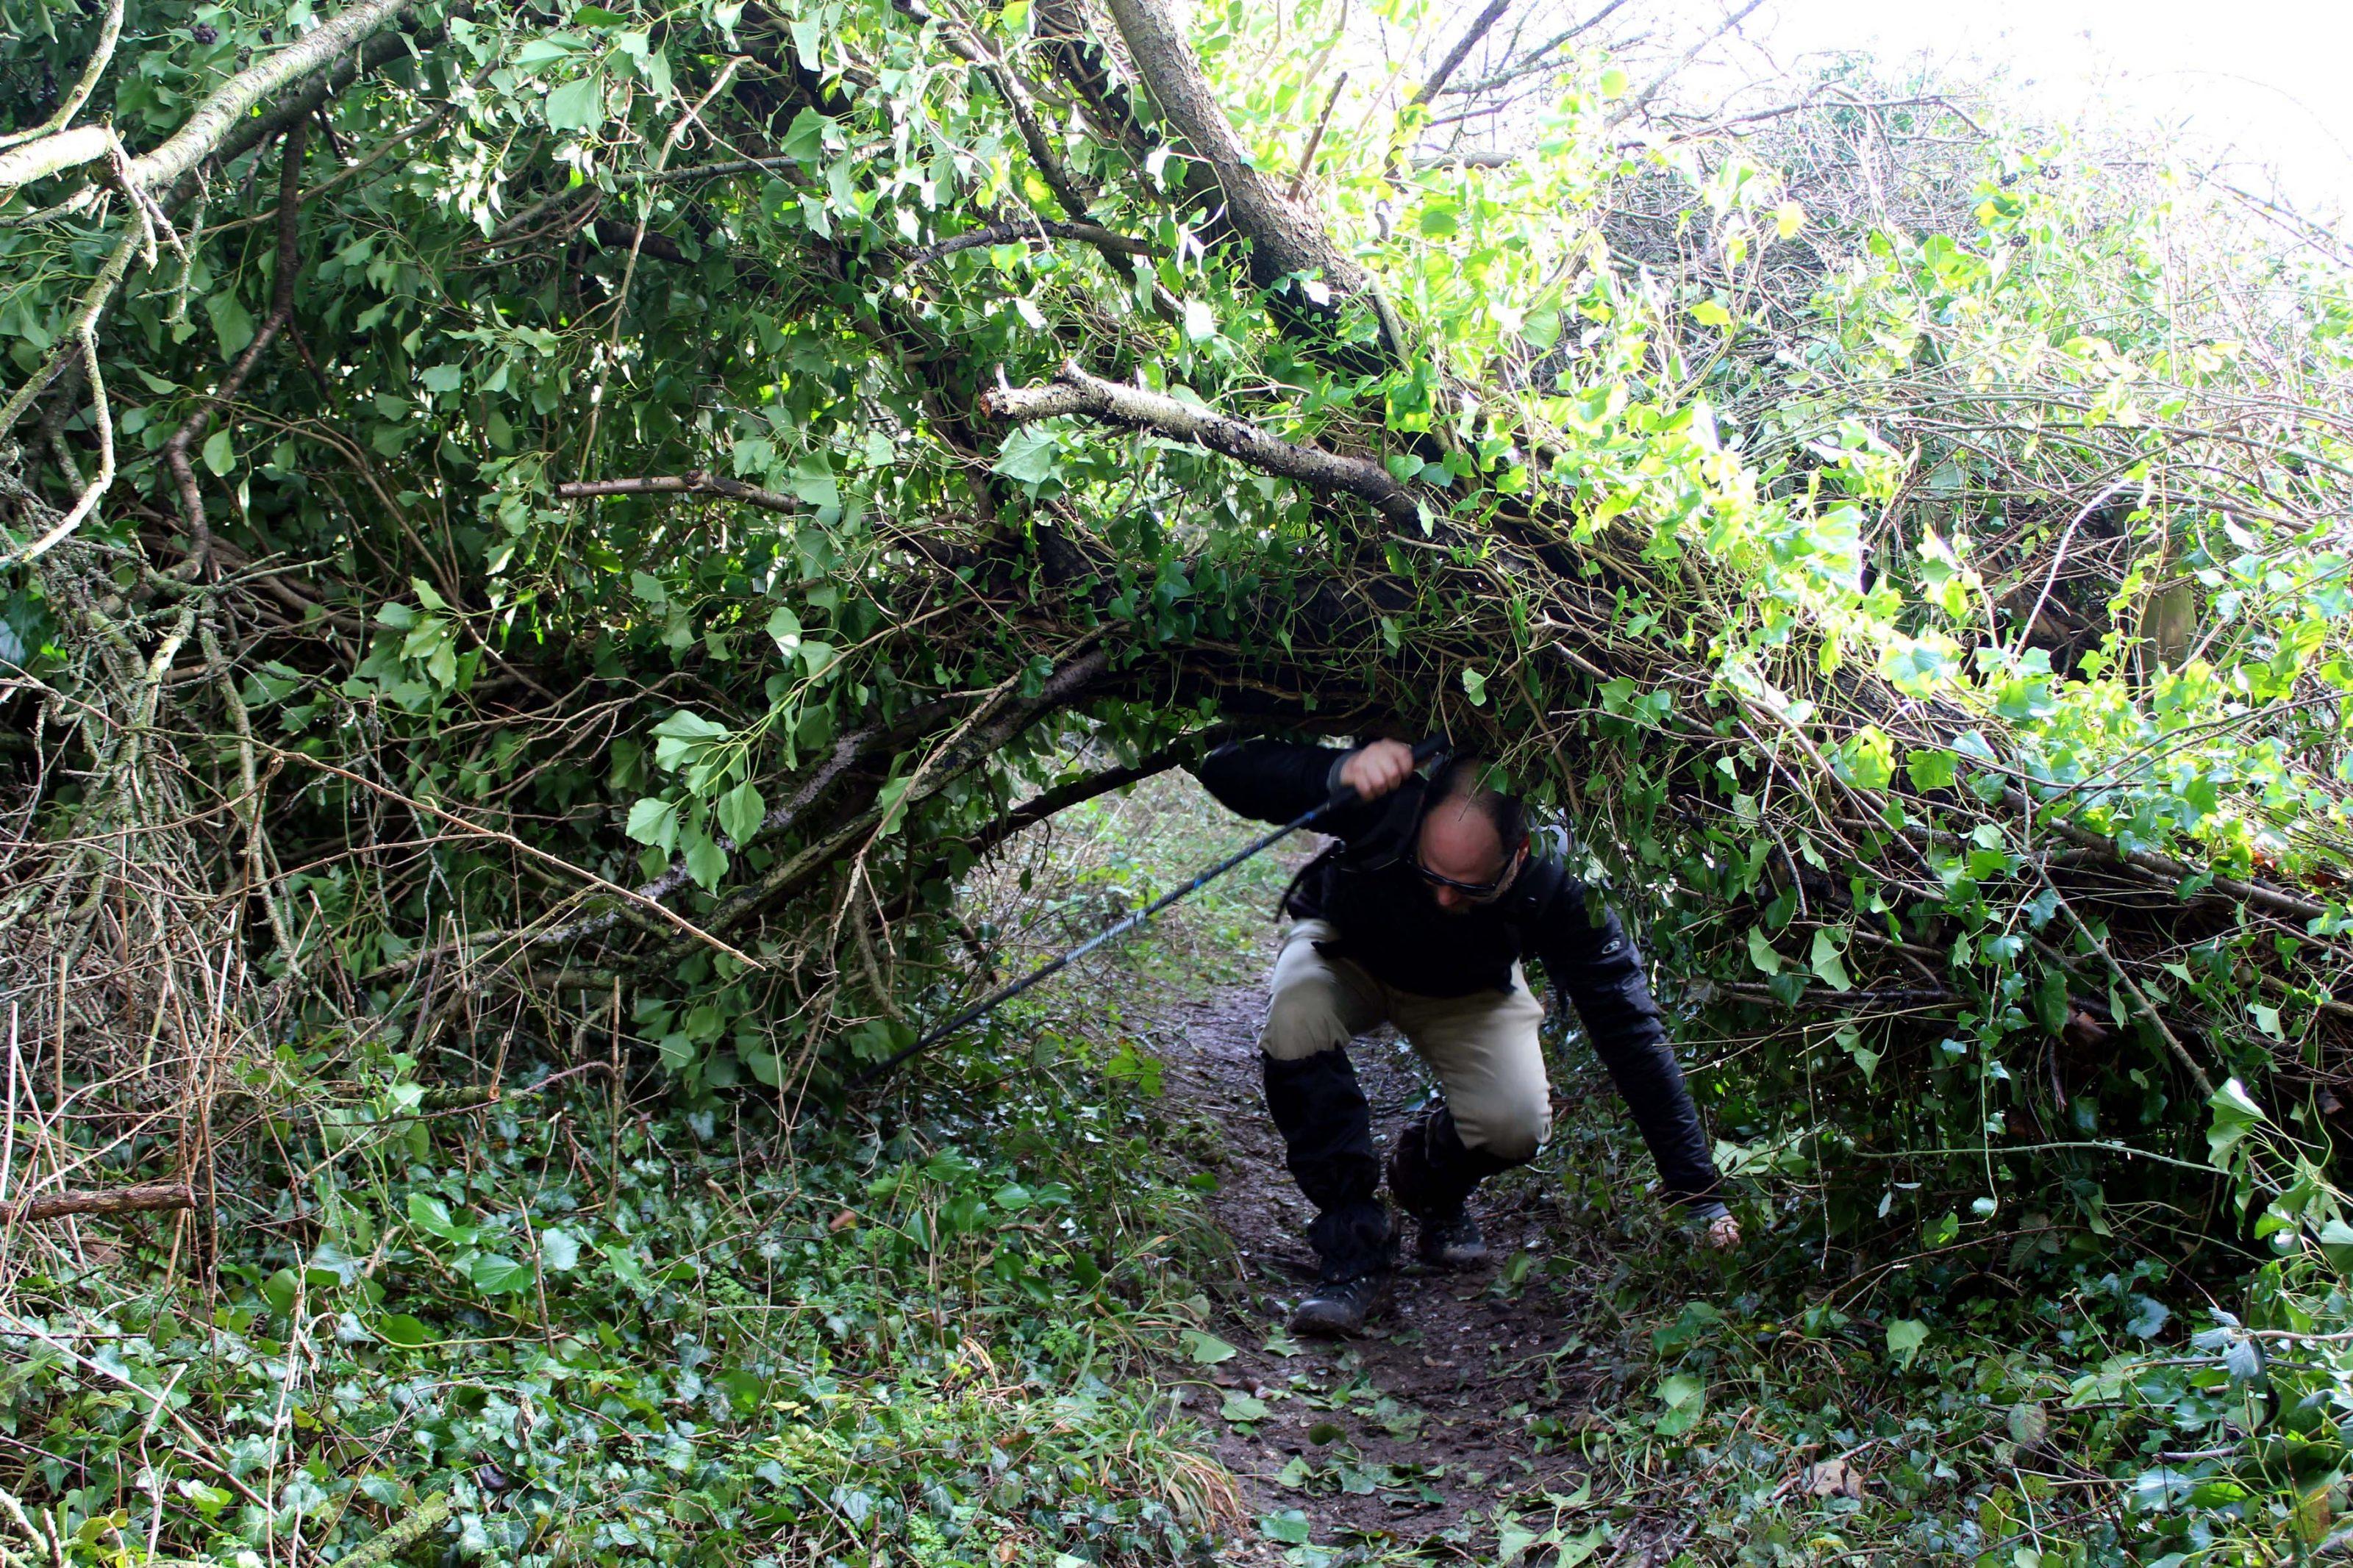 Great Stones Way long distance walking path - tree hazards